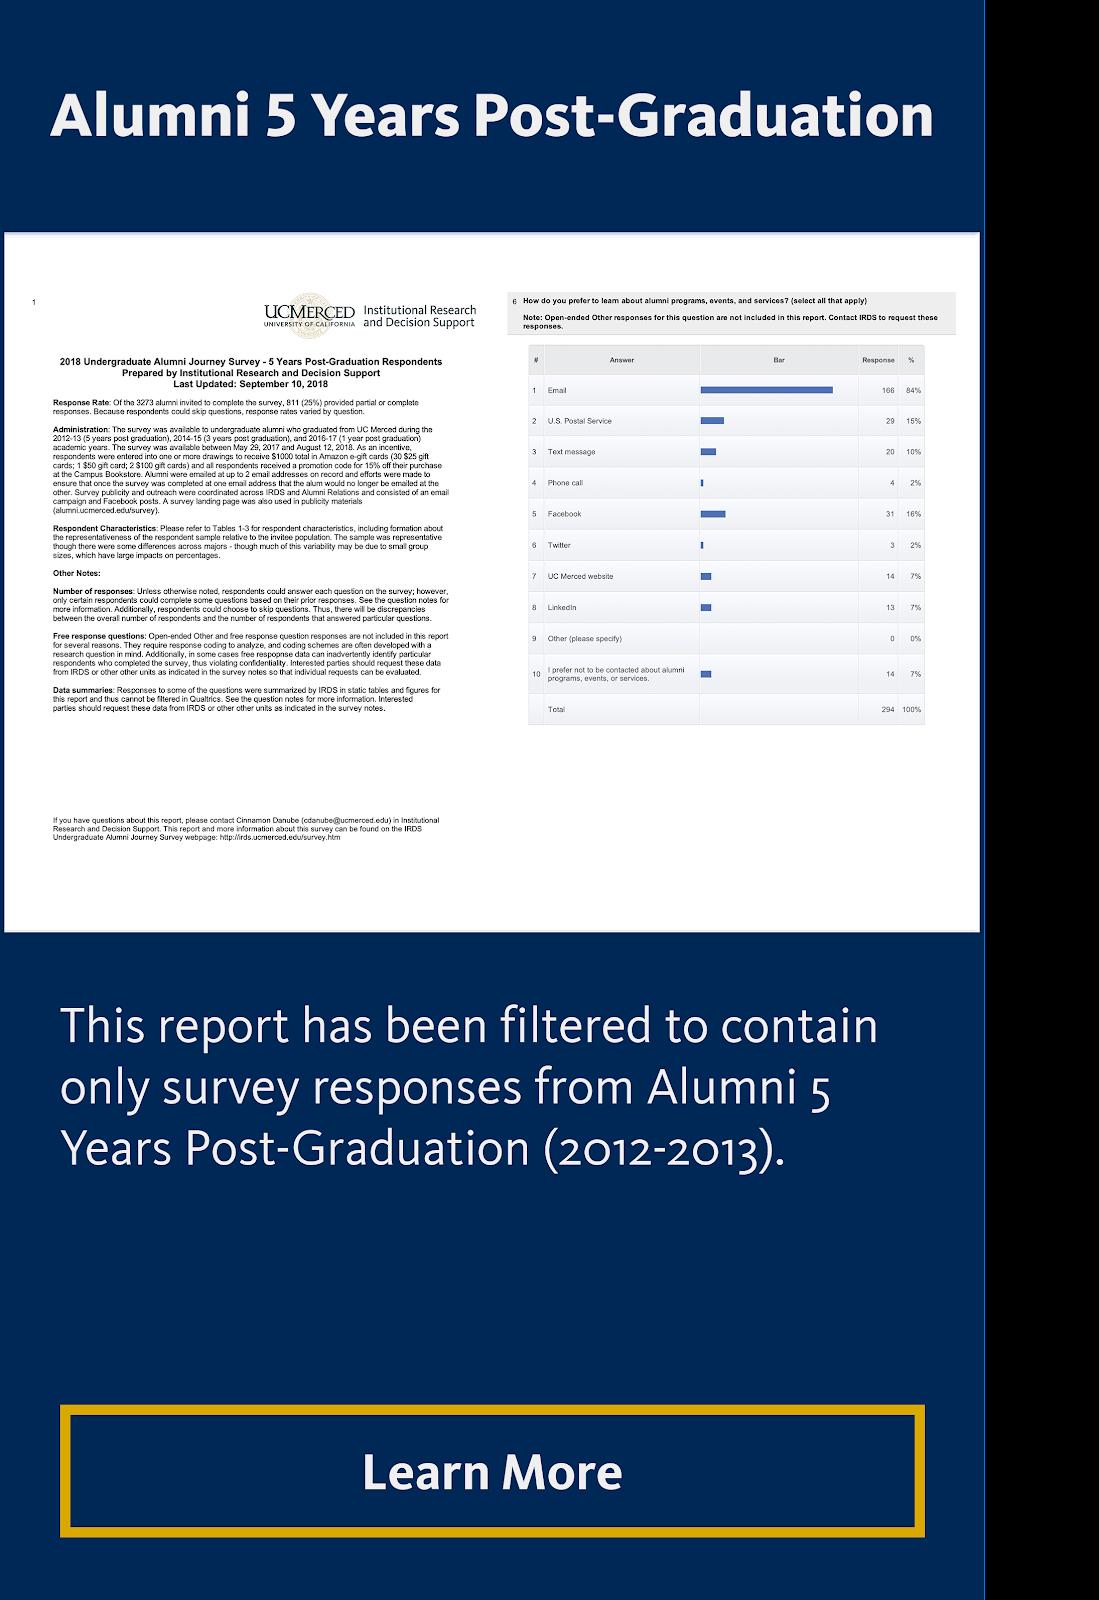 2018 Alumni 5 Years Post-Graduation